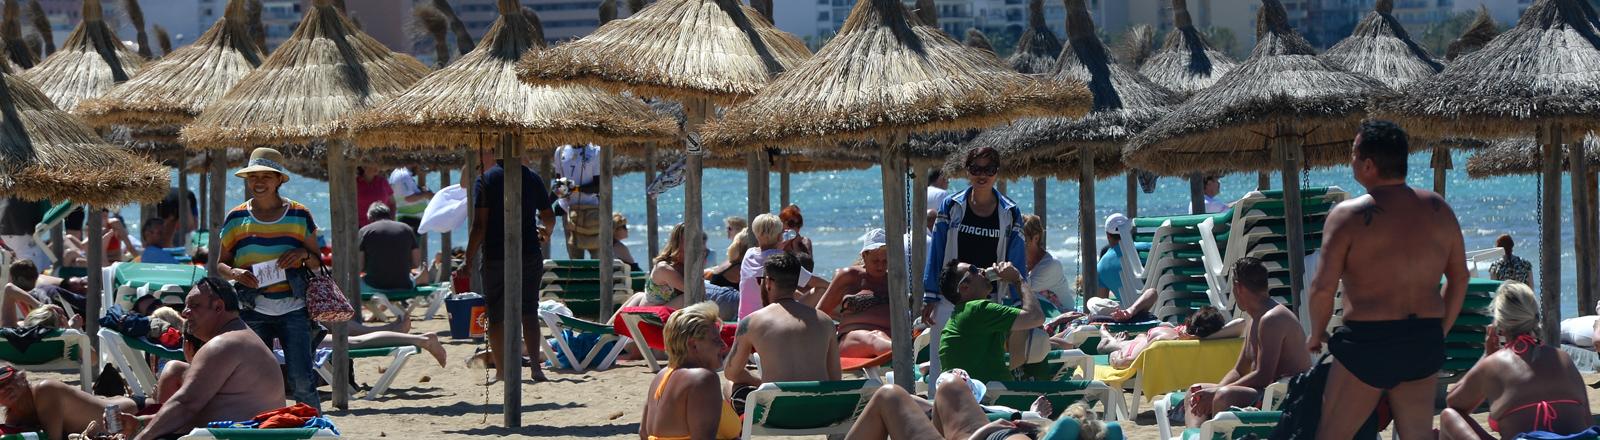 Strandleben an der Playa de Palma in S'Arenal, fotografiert am 03.05.2016 in Arenal (Spanien) bei Palma de Mallorca.